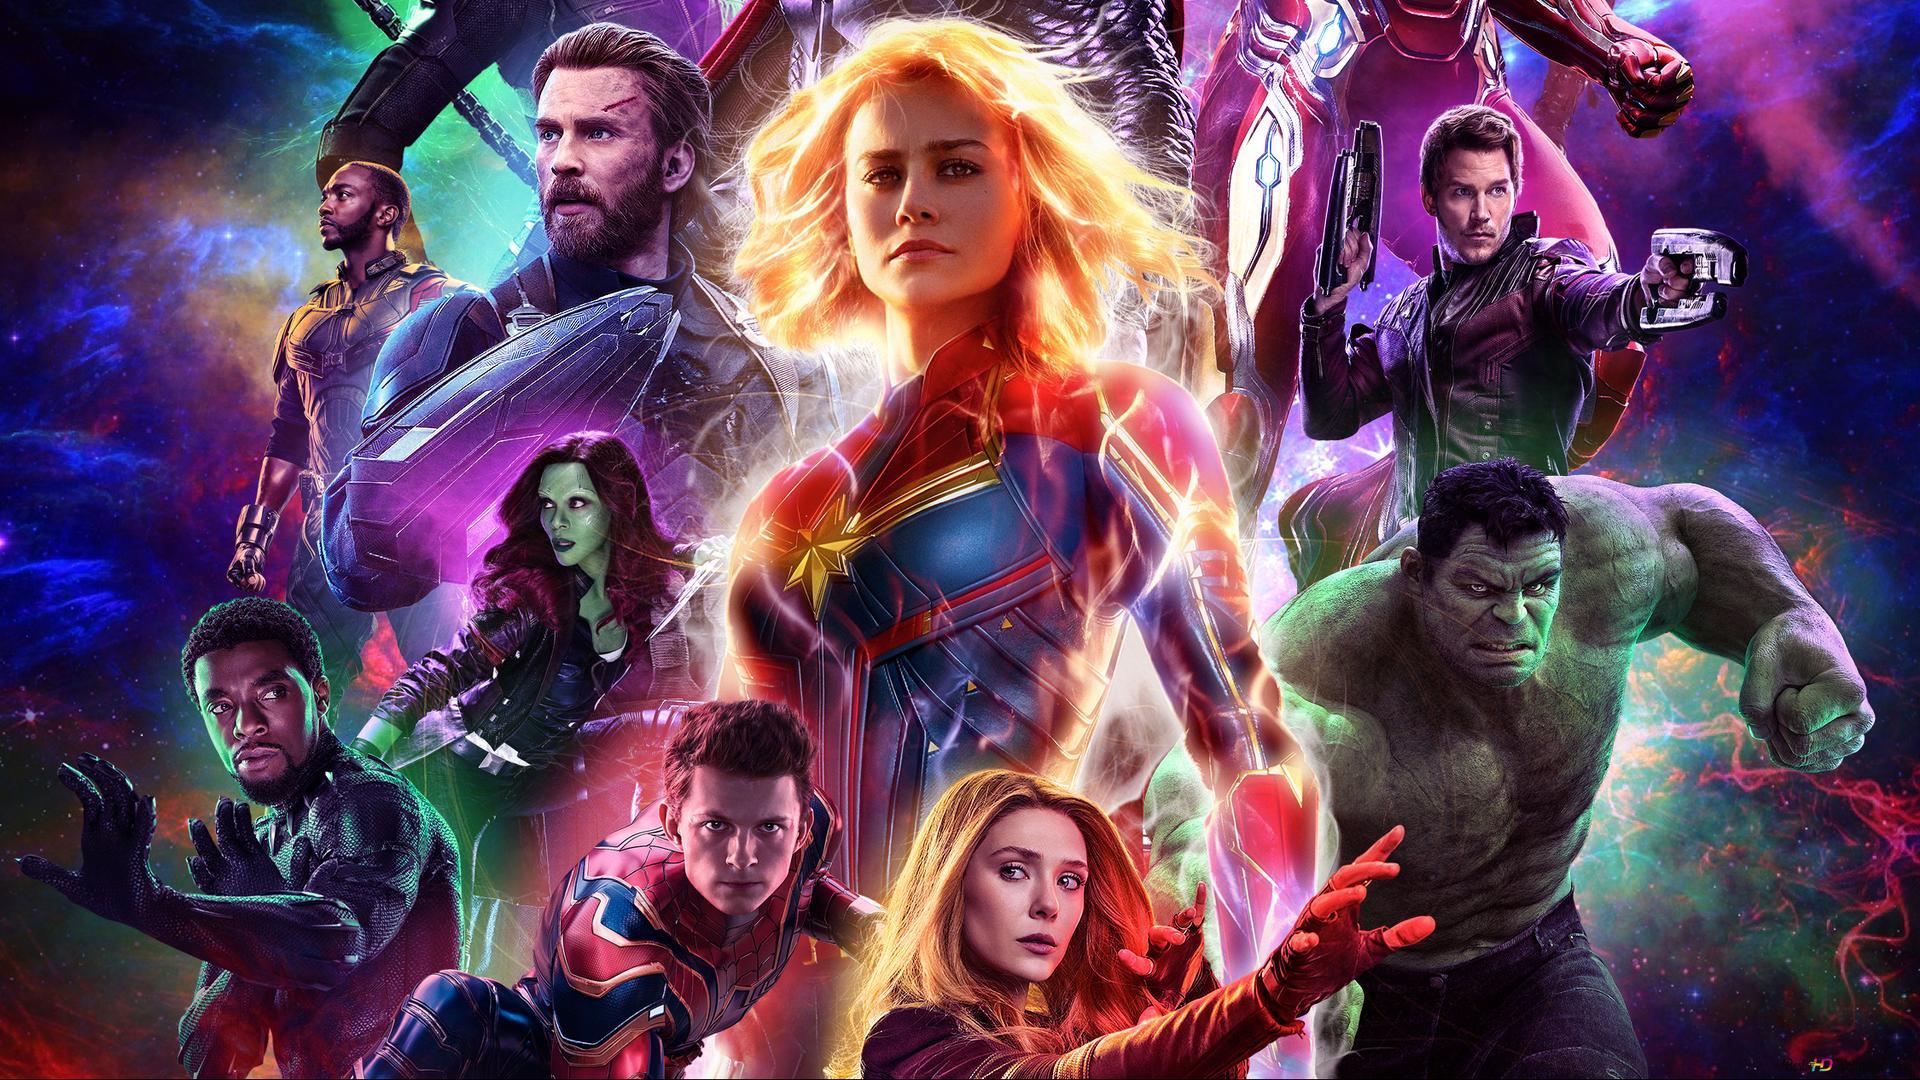 Avengers endgame aliens et heroes hd fond d 39 cran - Avengers 2 telecharger ...